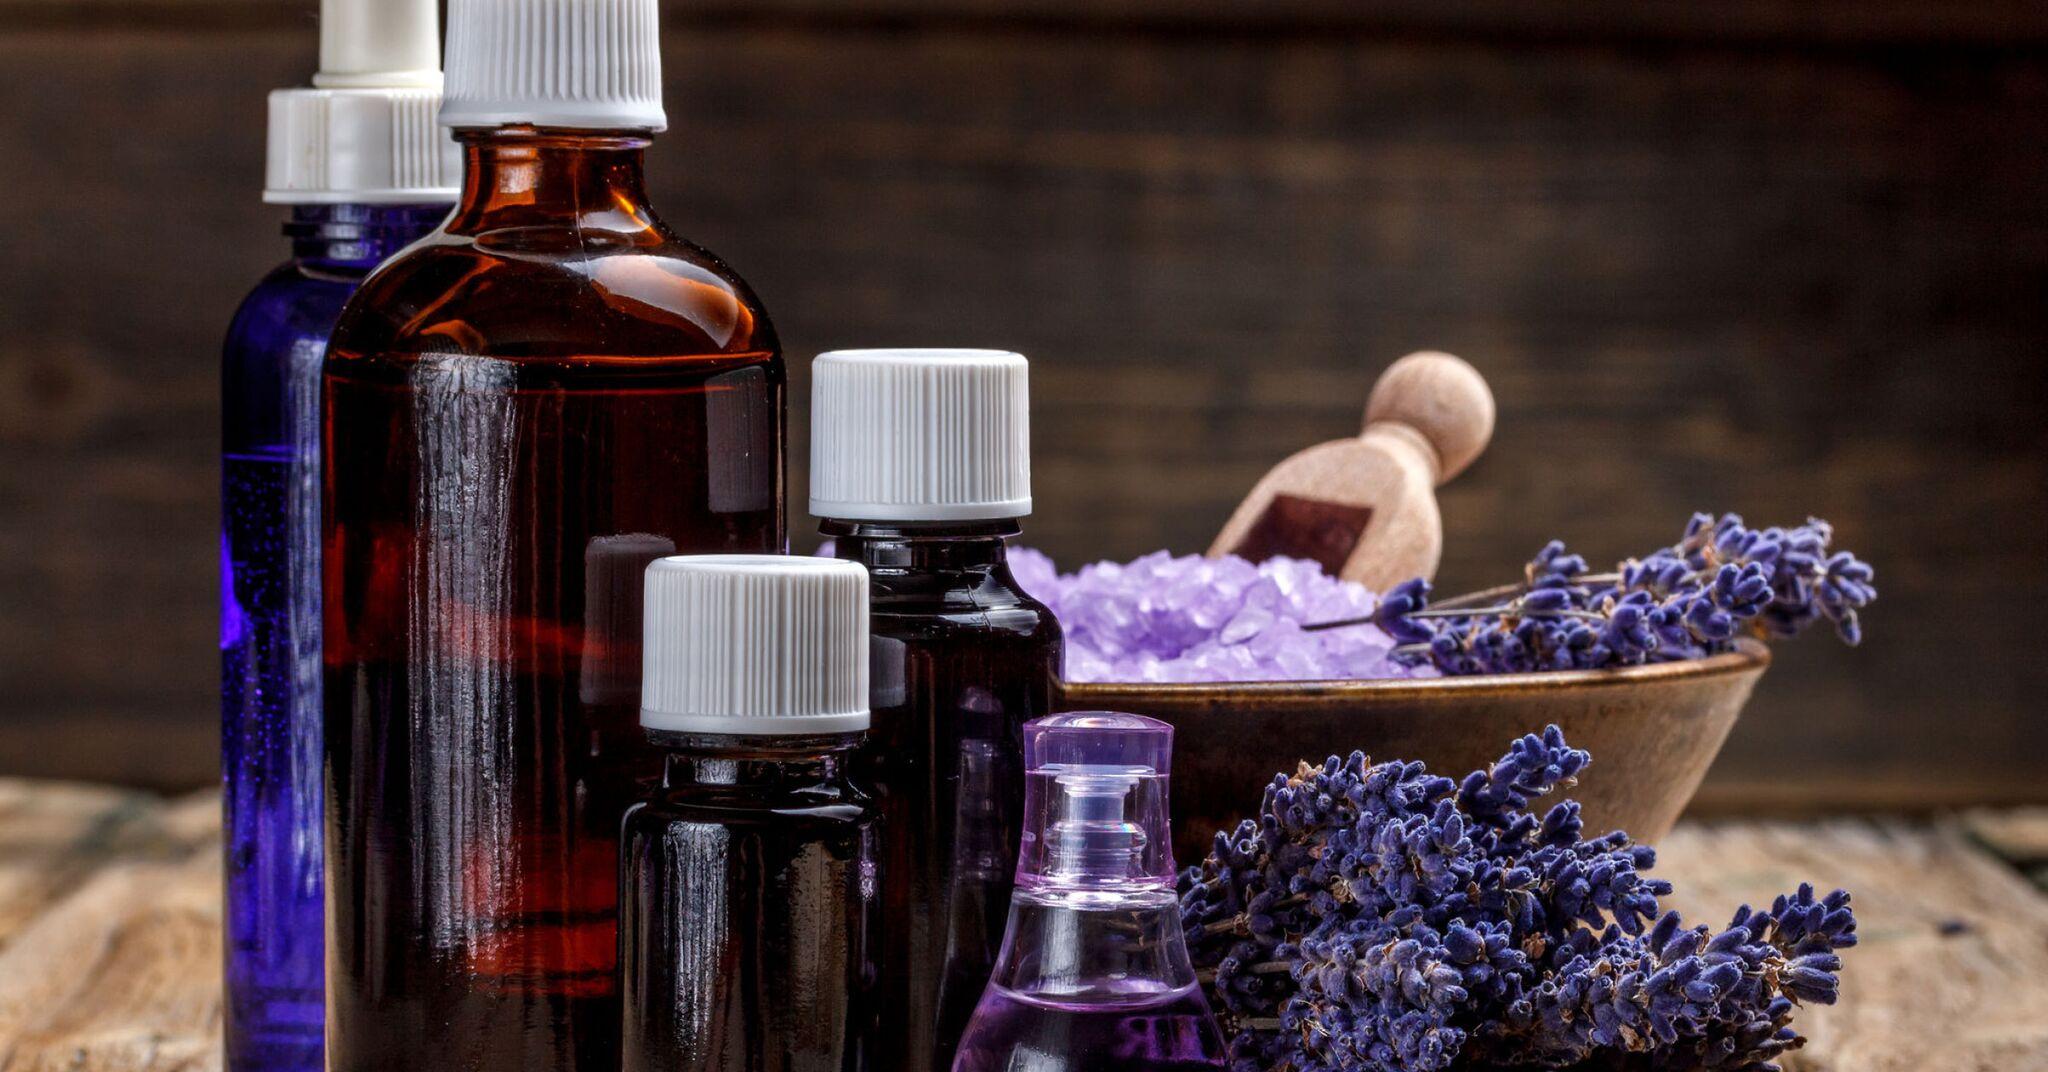 10 Essential Oils For Health 10 Essential Oils For Your Medicine Cabinet